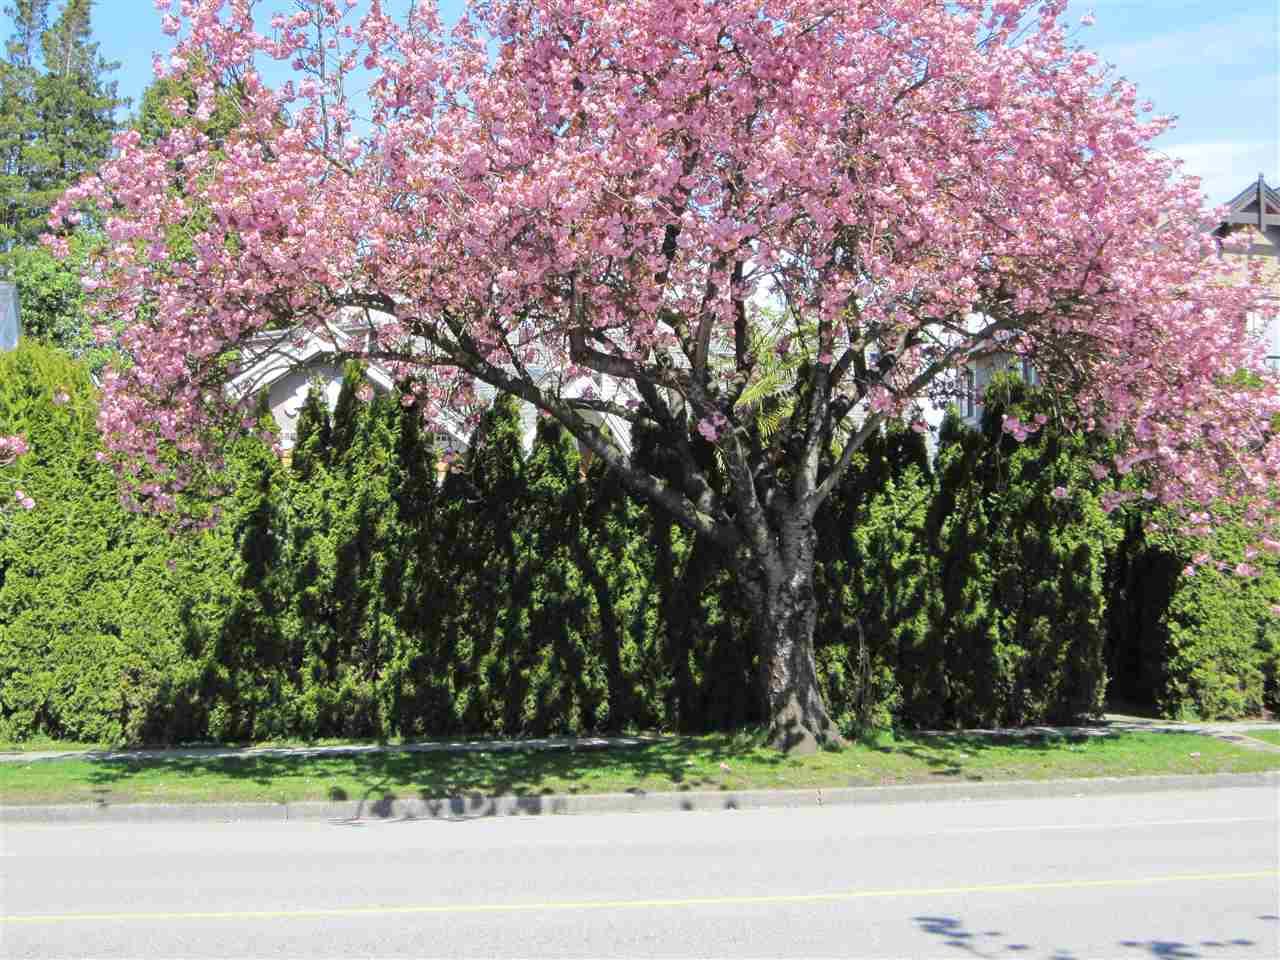 55 W KING EDWARD AVENUE, Vancouver, BC V5Y 2H6